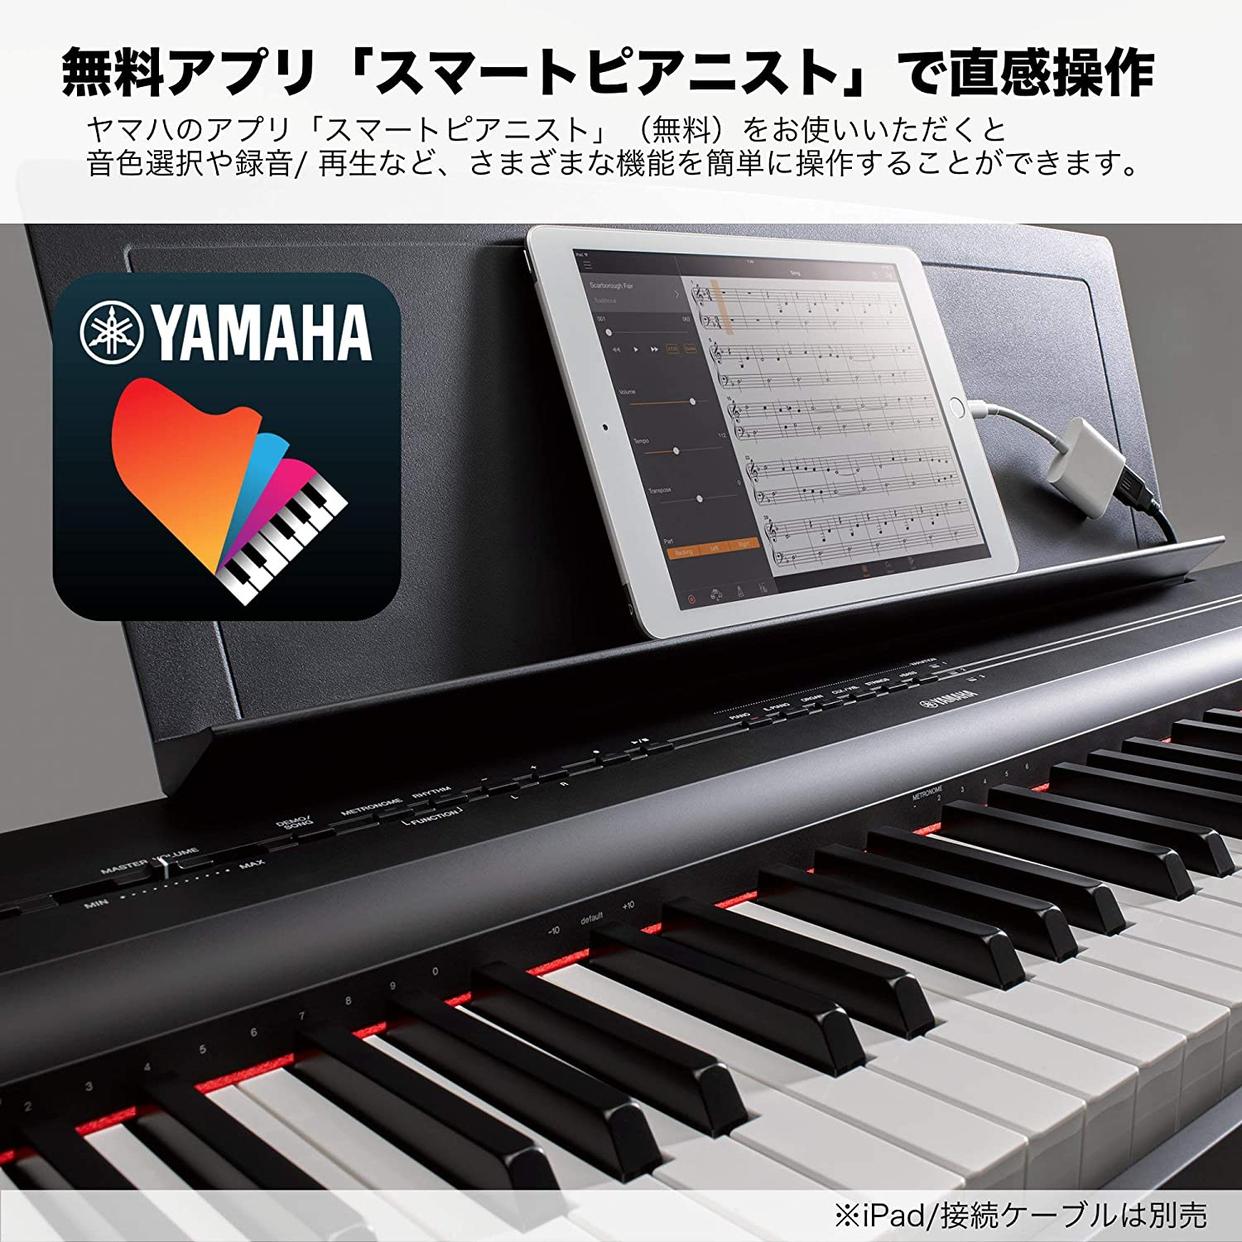 YAMAHA(ヤマハ) P-125の商品画像5